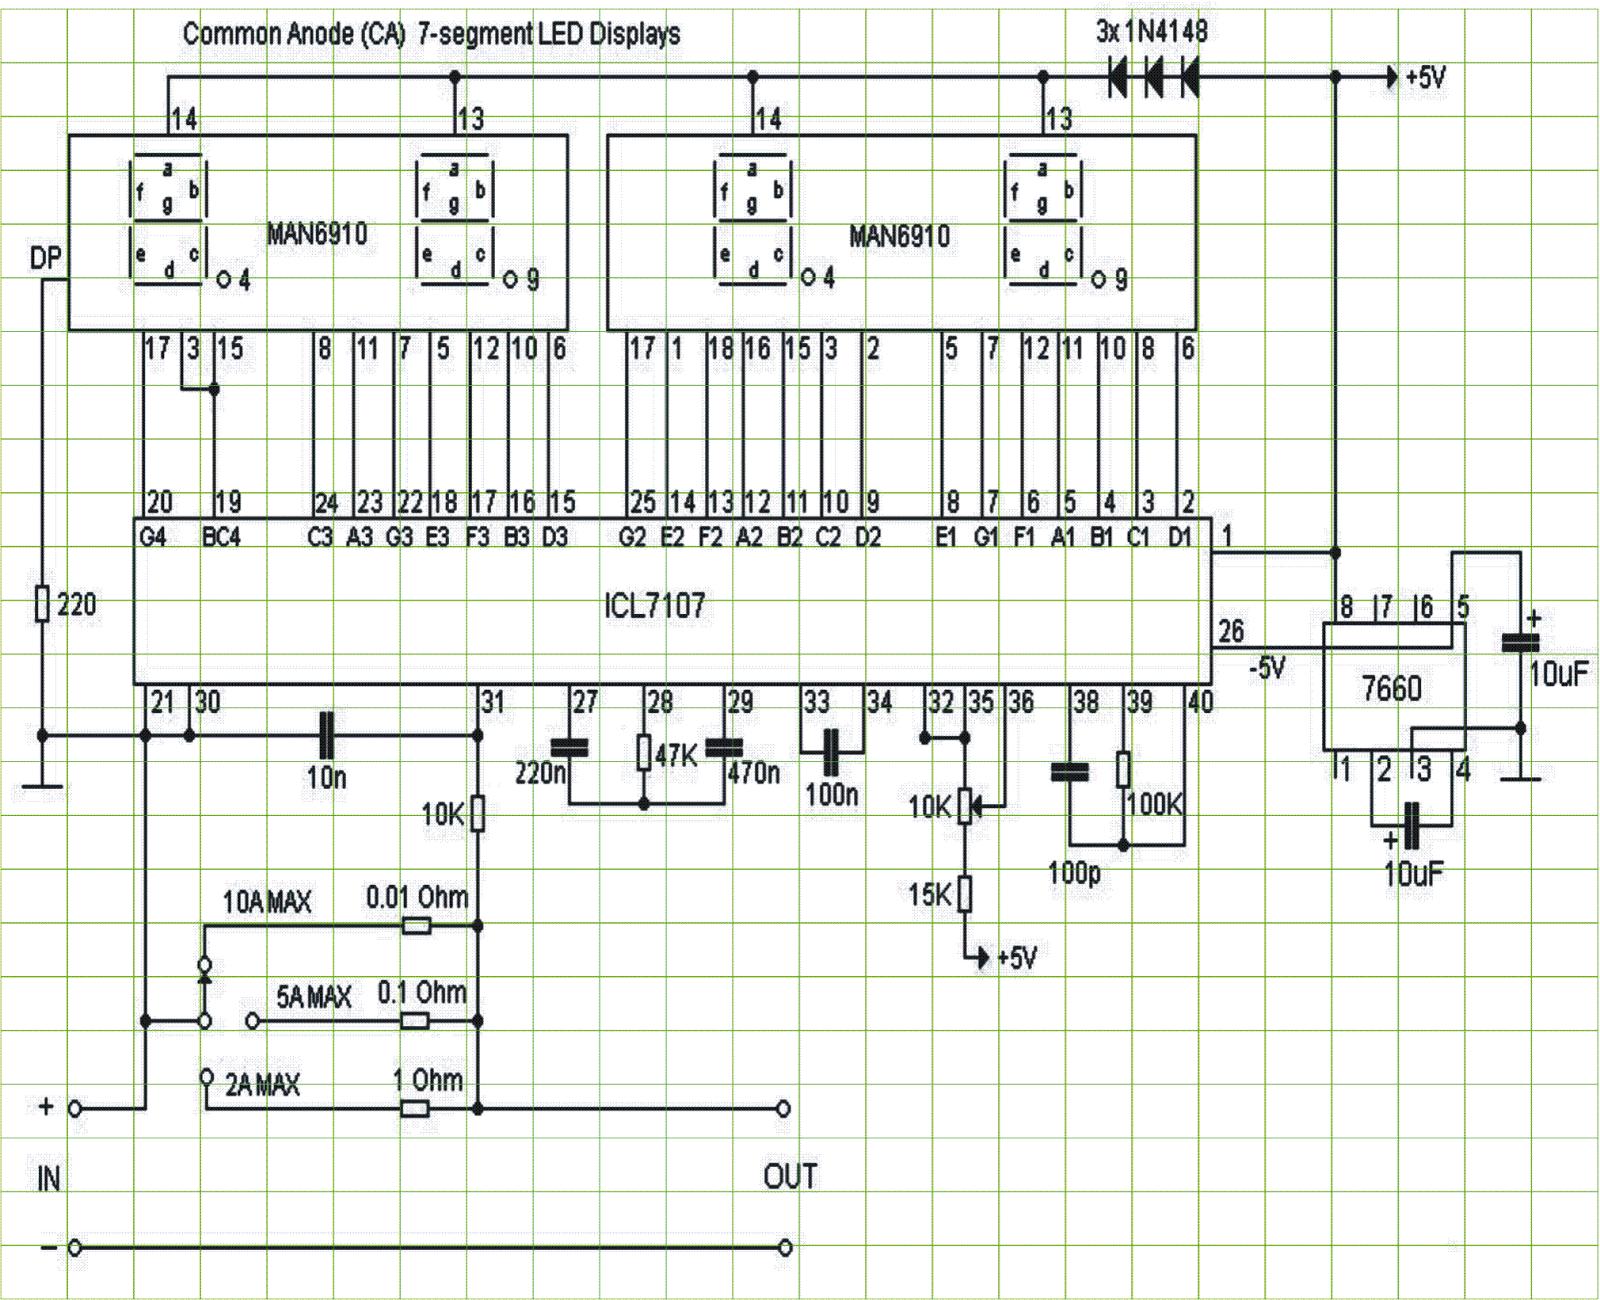 Icl7107 Ammeter Circuit Diagram Wiring Home Amperage Gauge Digital Using Ic L7107 Expert Circuits Gm Amp